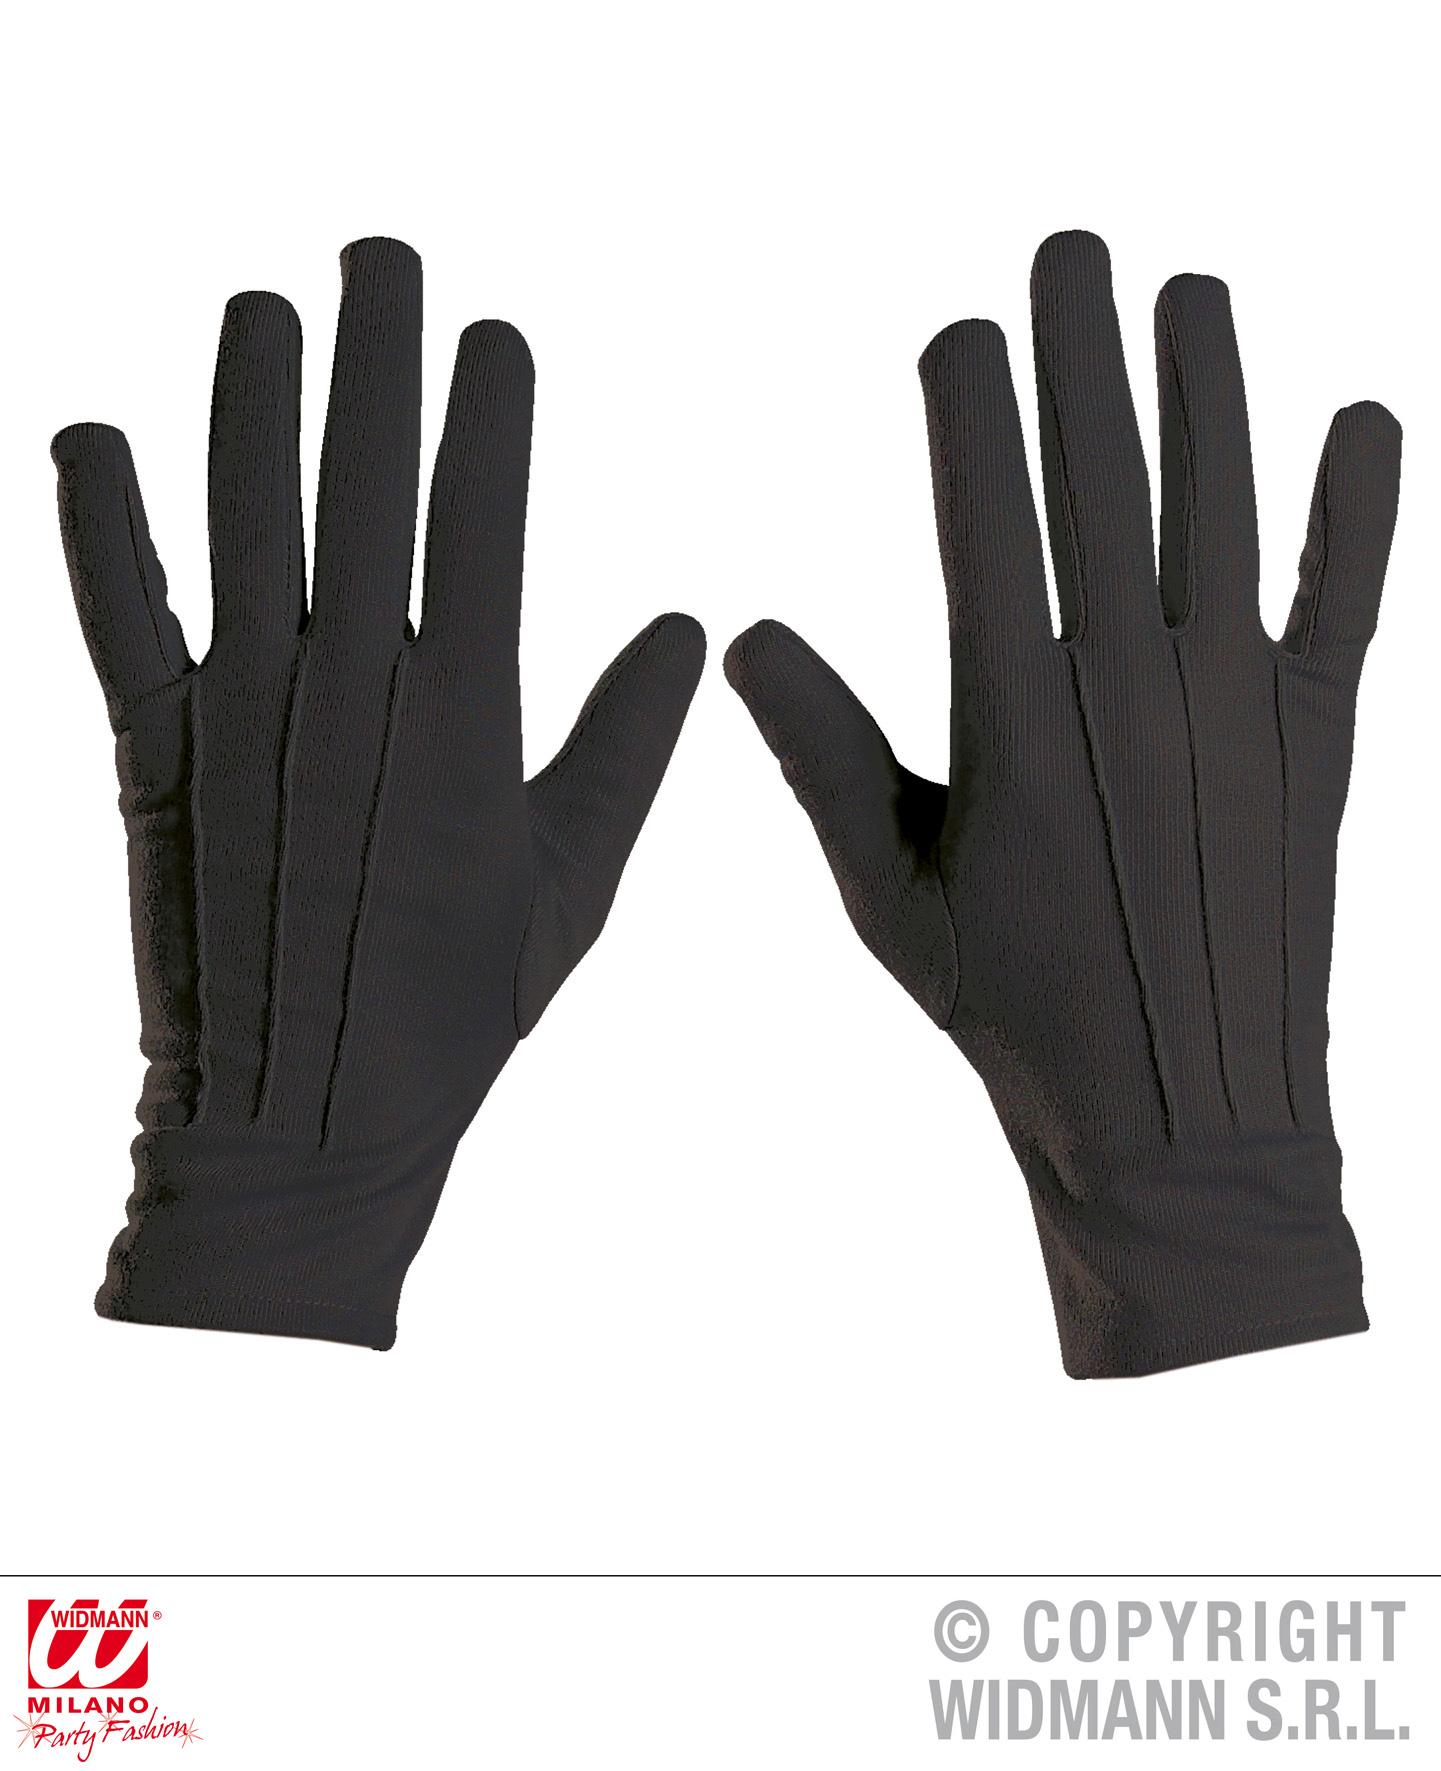 Finger Handschuhe kurz SCHWARZ, Erwachsene Vampir, Zauberer, Magier